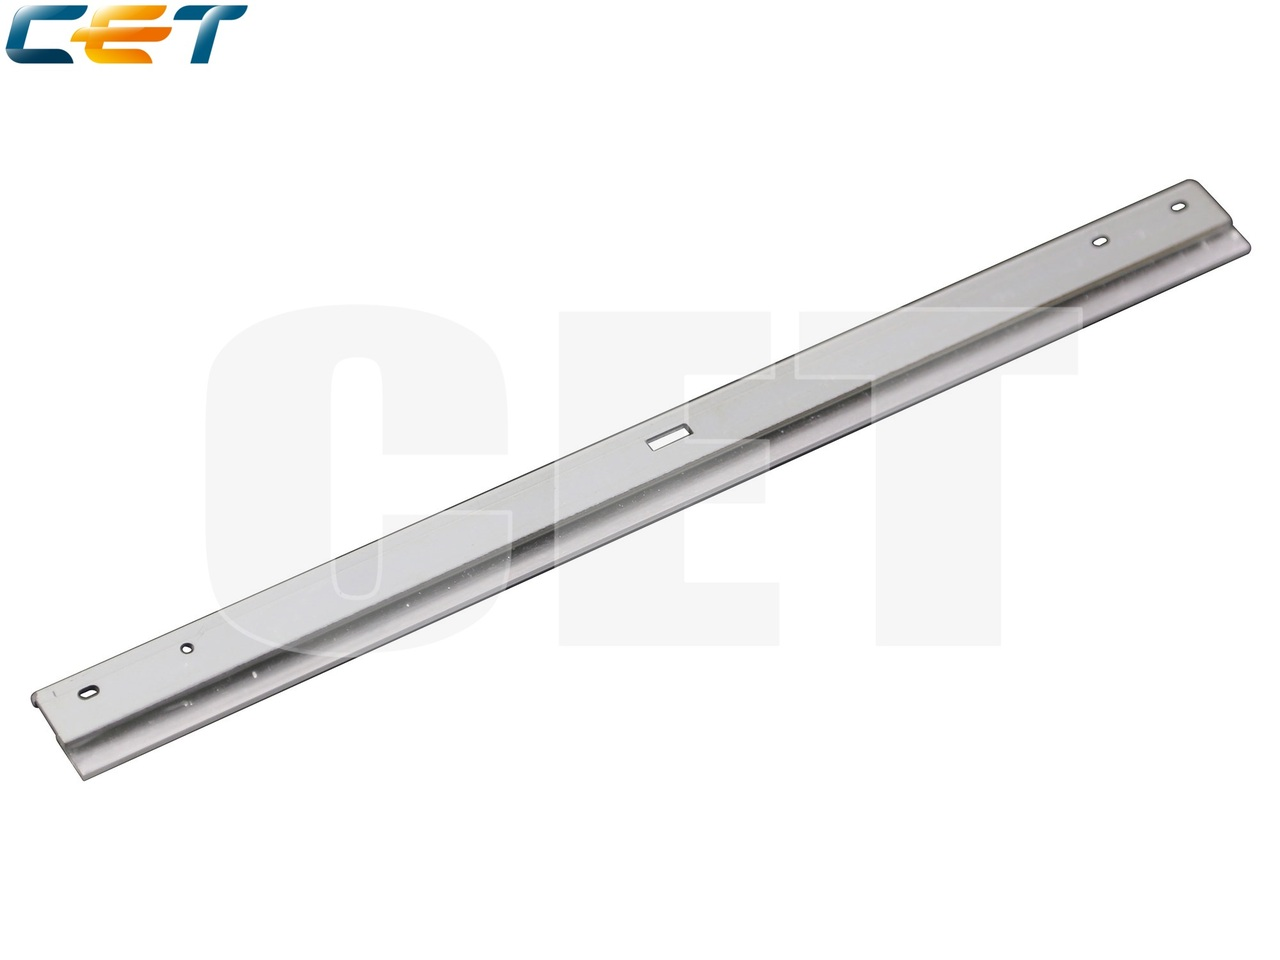 Ракель для SAMSUNG CLX-9252NA/9352NA/9250ND/9350ND(CET), CET3580